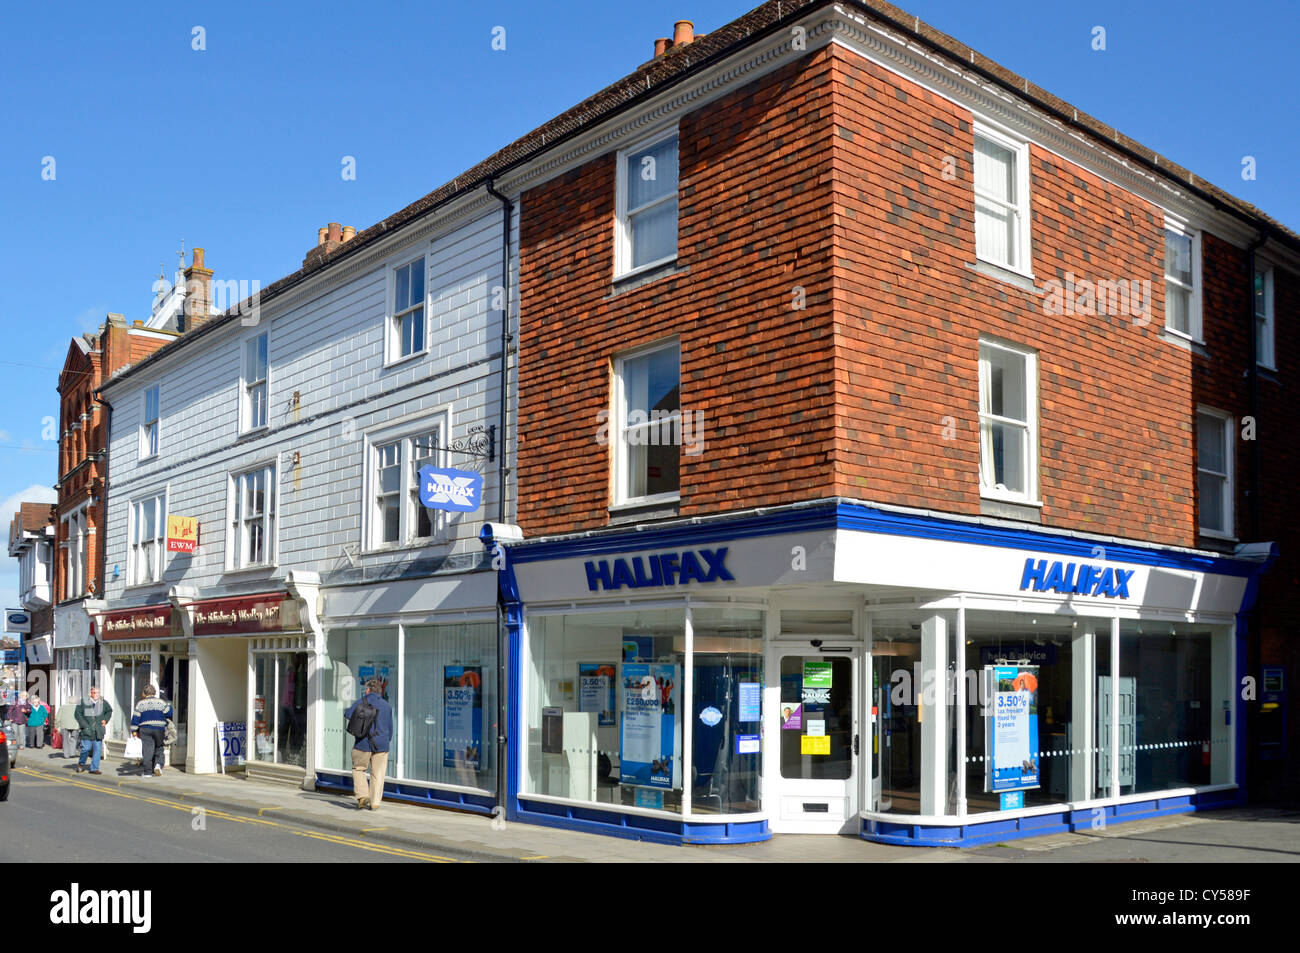 Halifax Bank branch premises High Street Sevenoaks Kent England UK - Stock Image